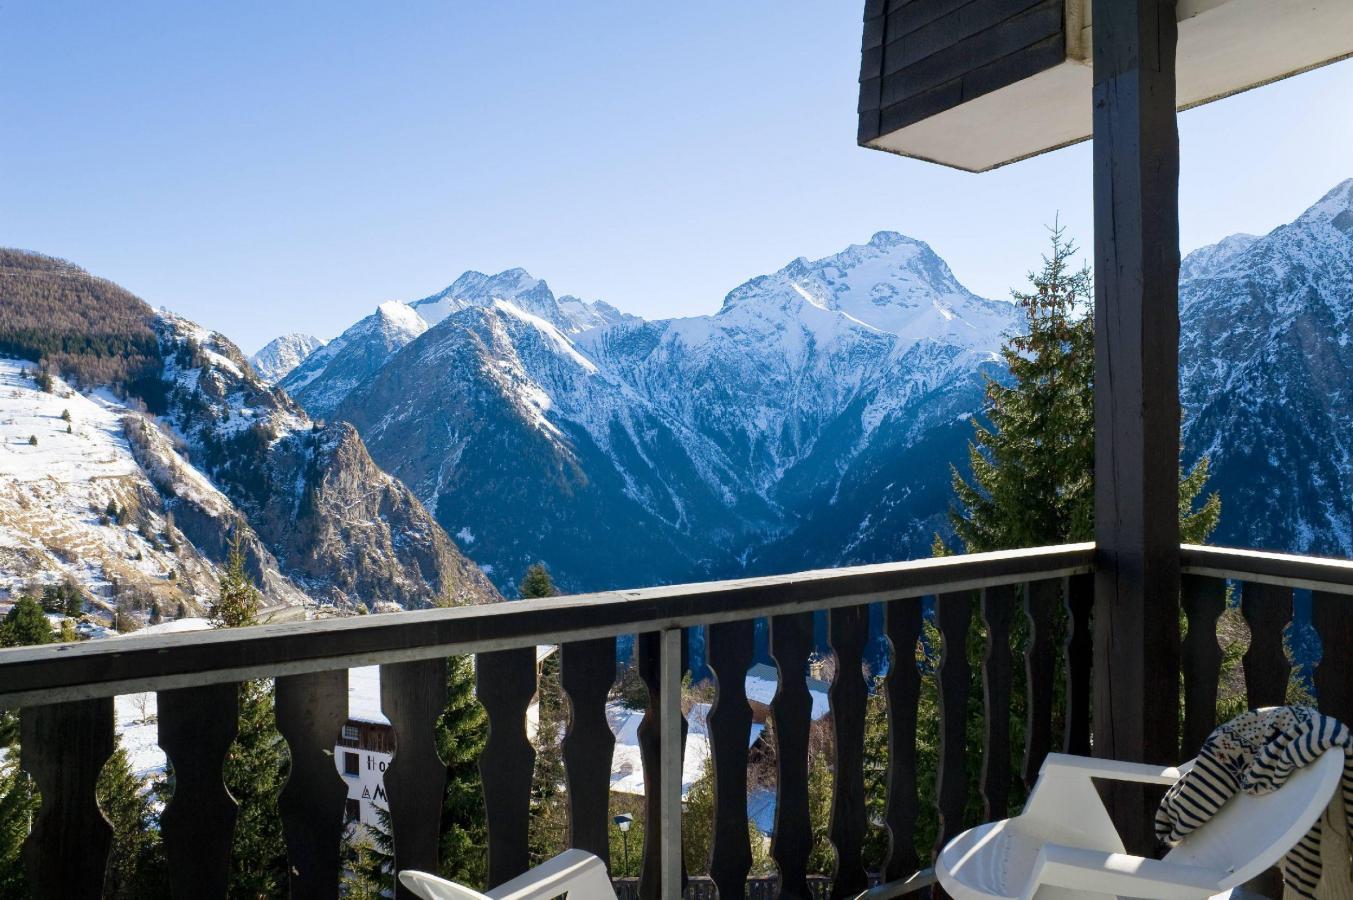 Hotel ibiza 29 les 2 alpes location vacances ski les 2 for Hotels 2 alpes